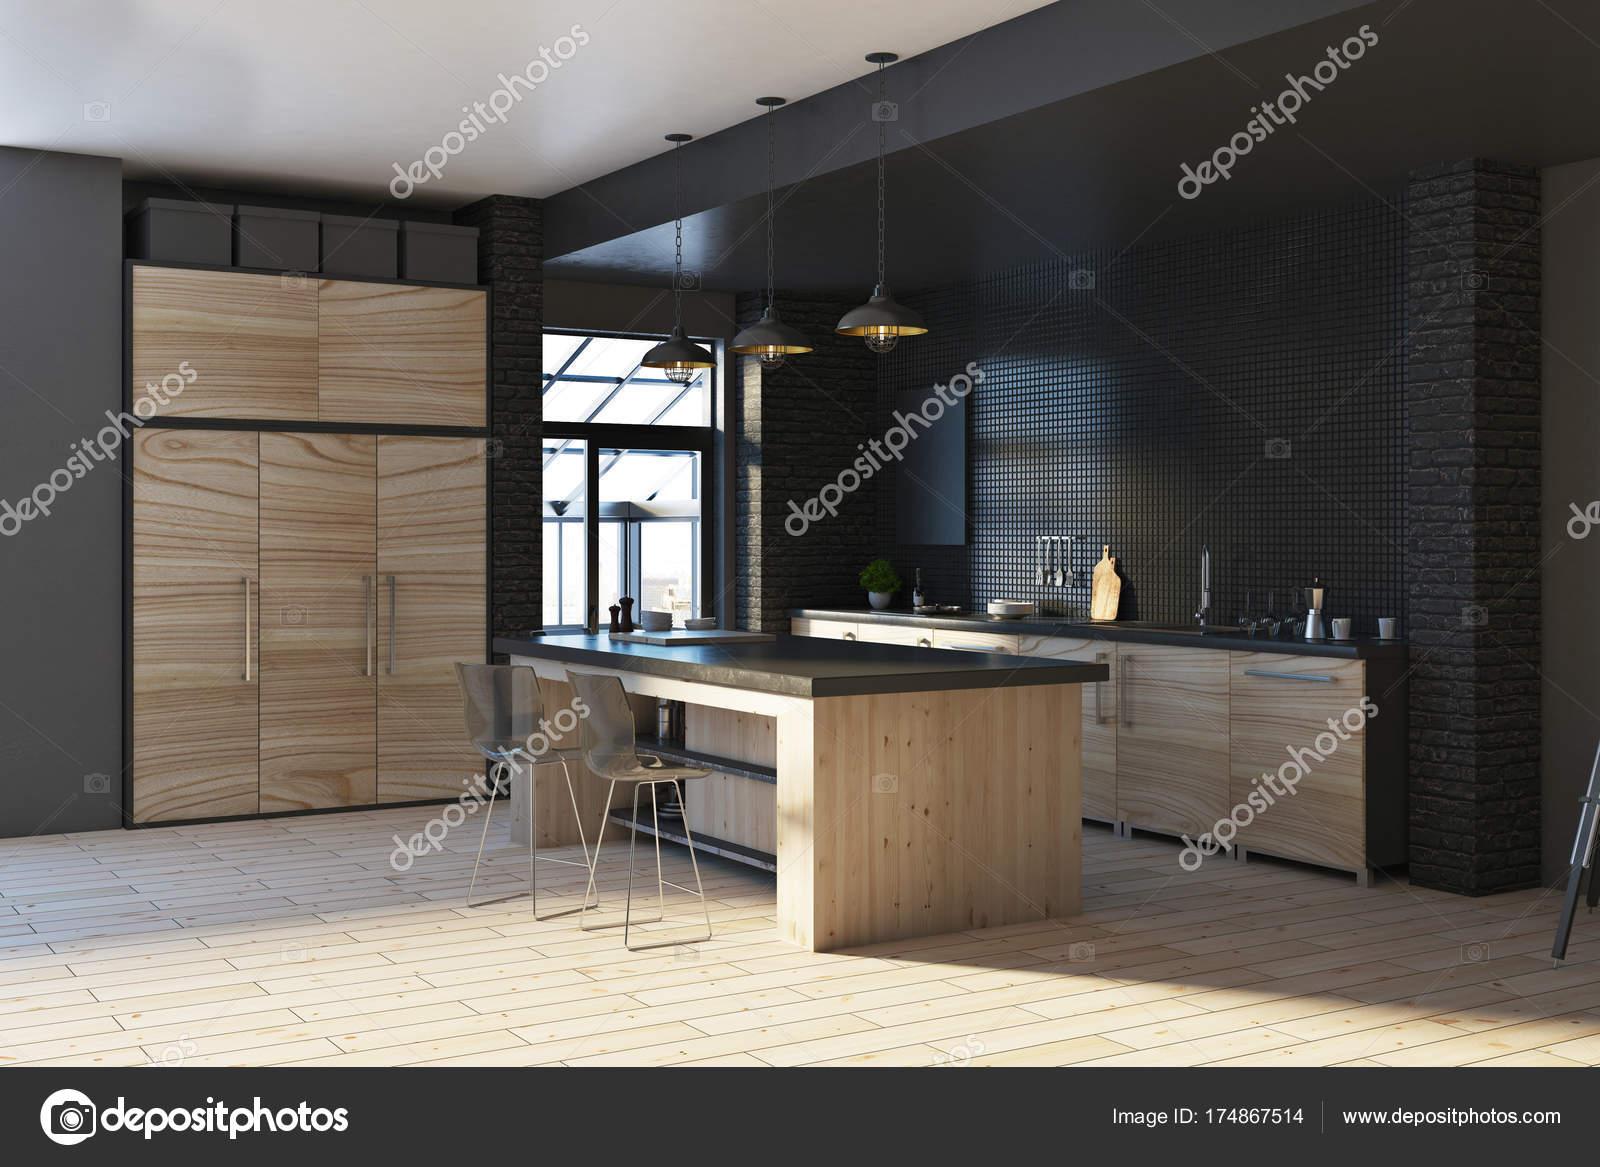 moderne loft schwarze k che interieur stockfoto peshkova 174867514. Black Bedroom Furniture Sets. Home Design Ideas